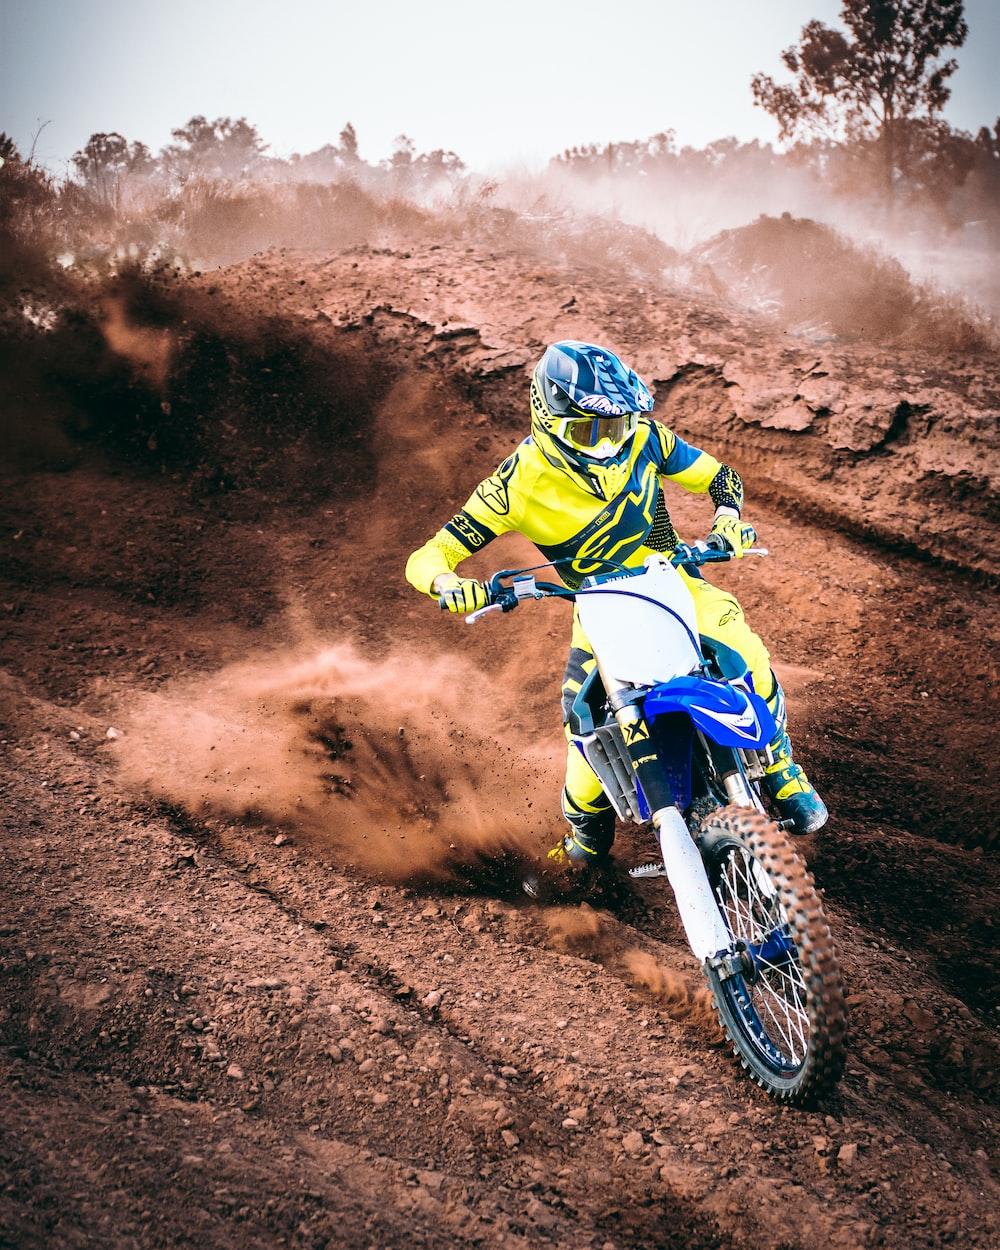 person rides motocross dirt bike